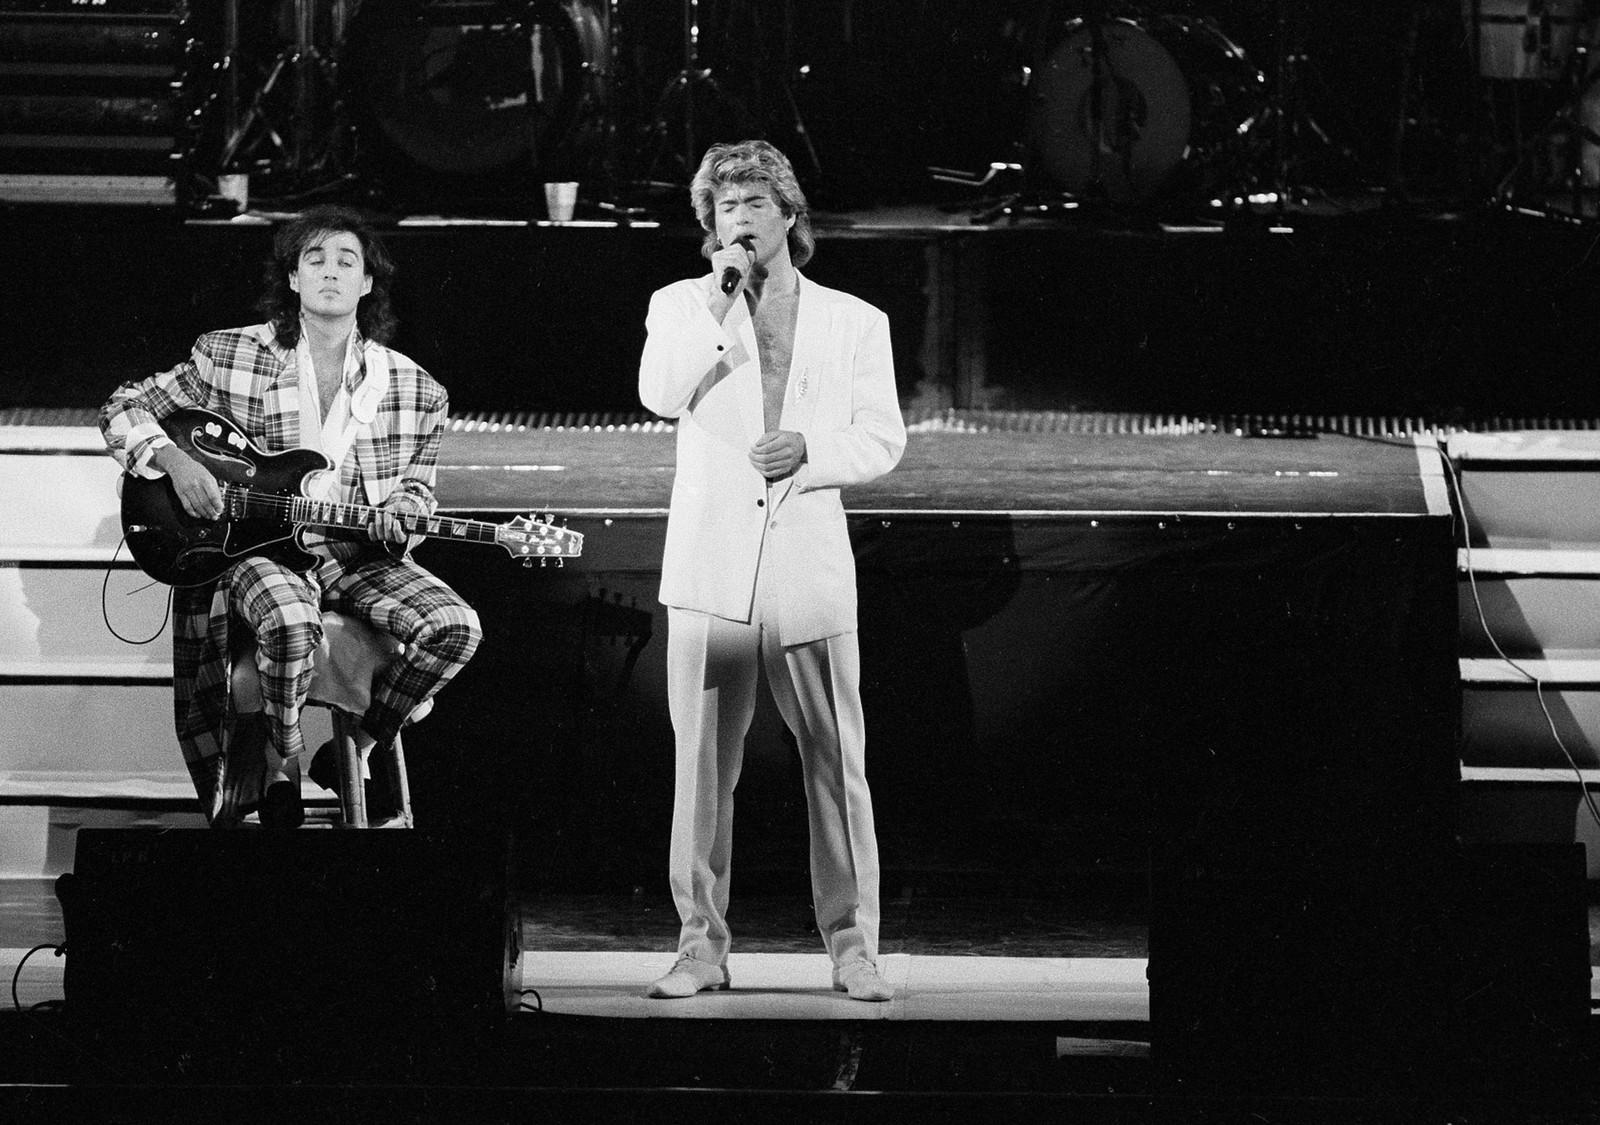 1985: George Michael og Andrew Ridgeley var blant de første vestlige popstjernene som spilte i Kina. Her er de på scenen i Beijing 7. april 1985.